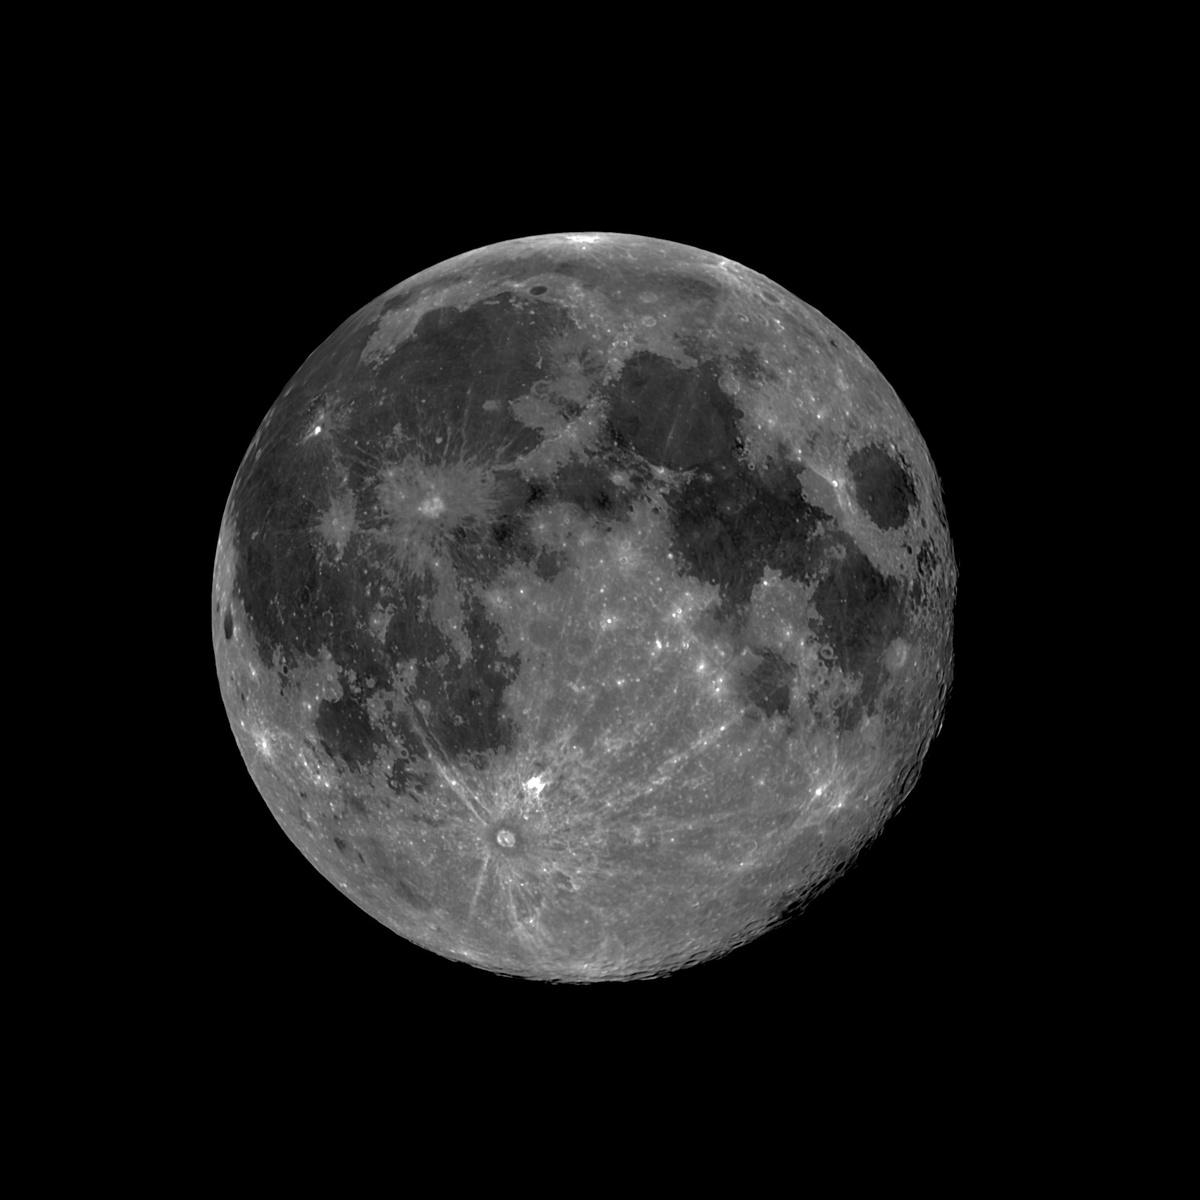 Moon5_2.thumb.jpg.b2dc0ae21f4d65e09709887a9d7b5c4b.jpg